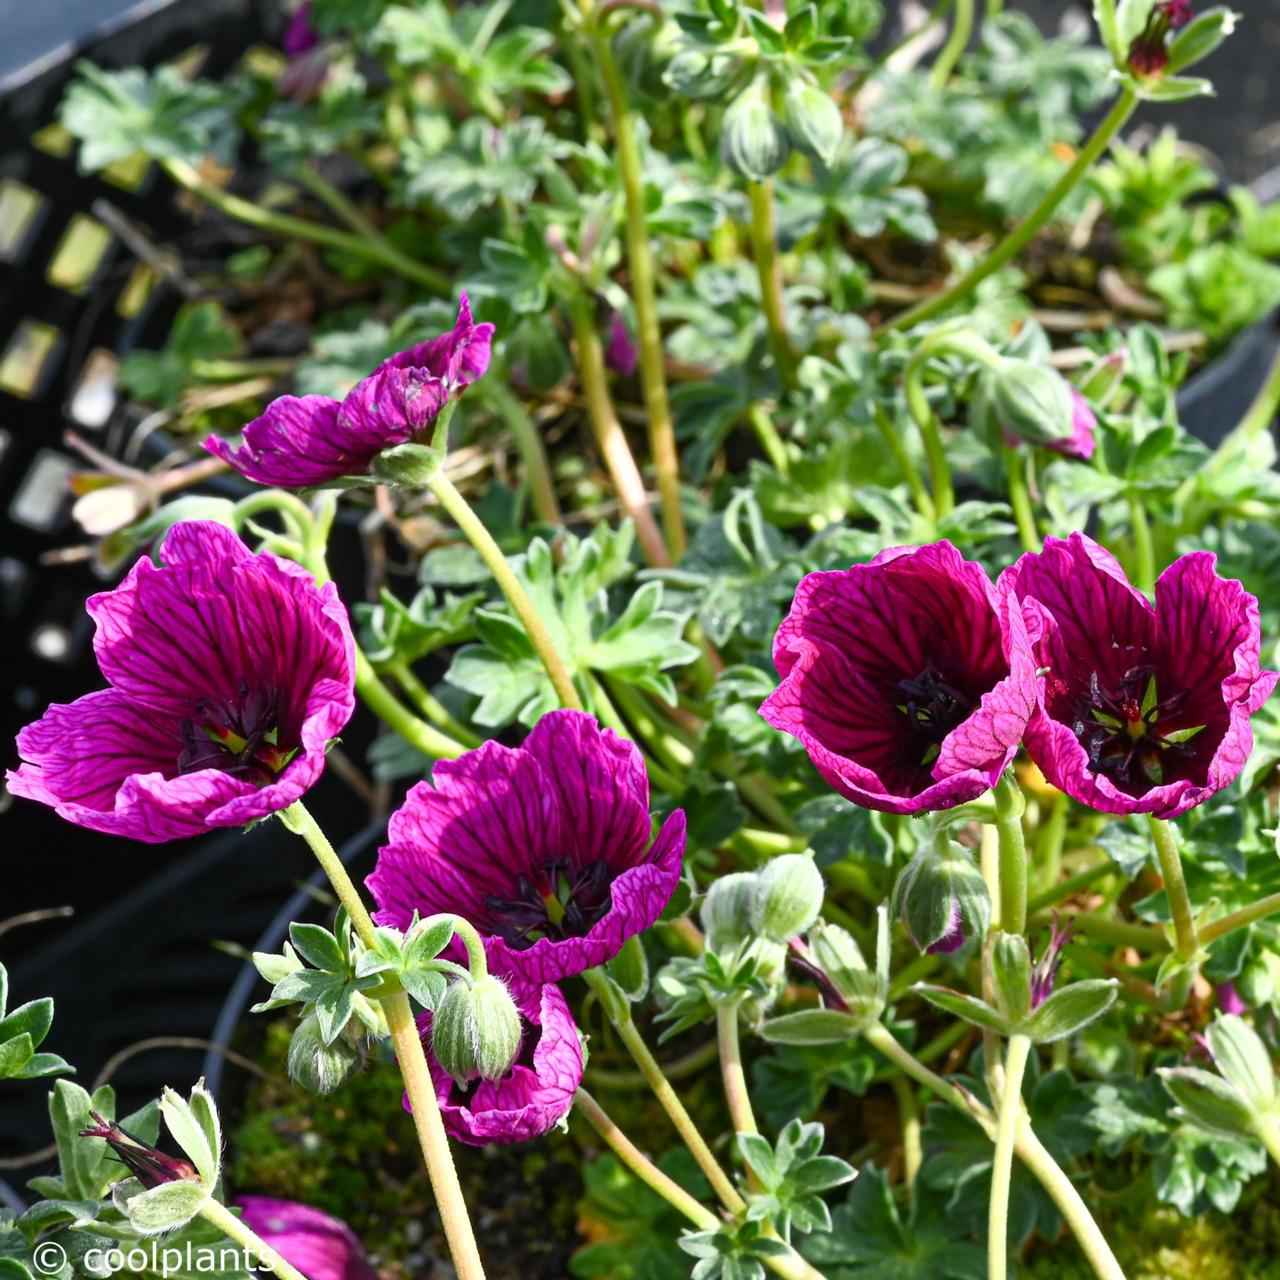 Geranium 'Jolly Jewel Purple' plant